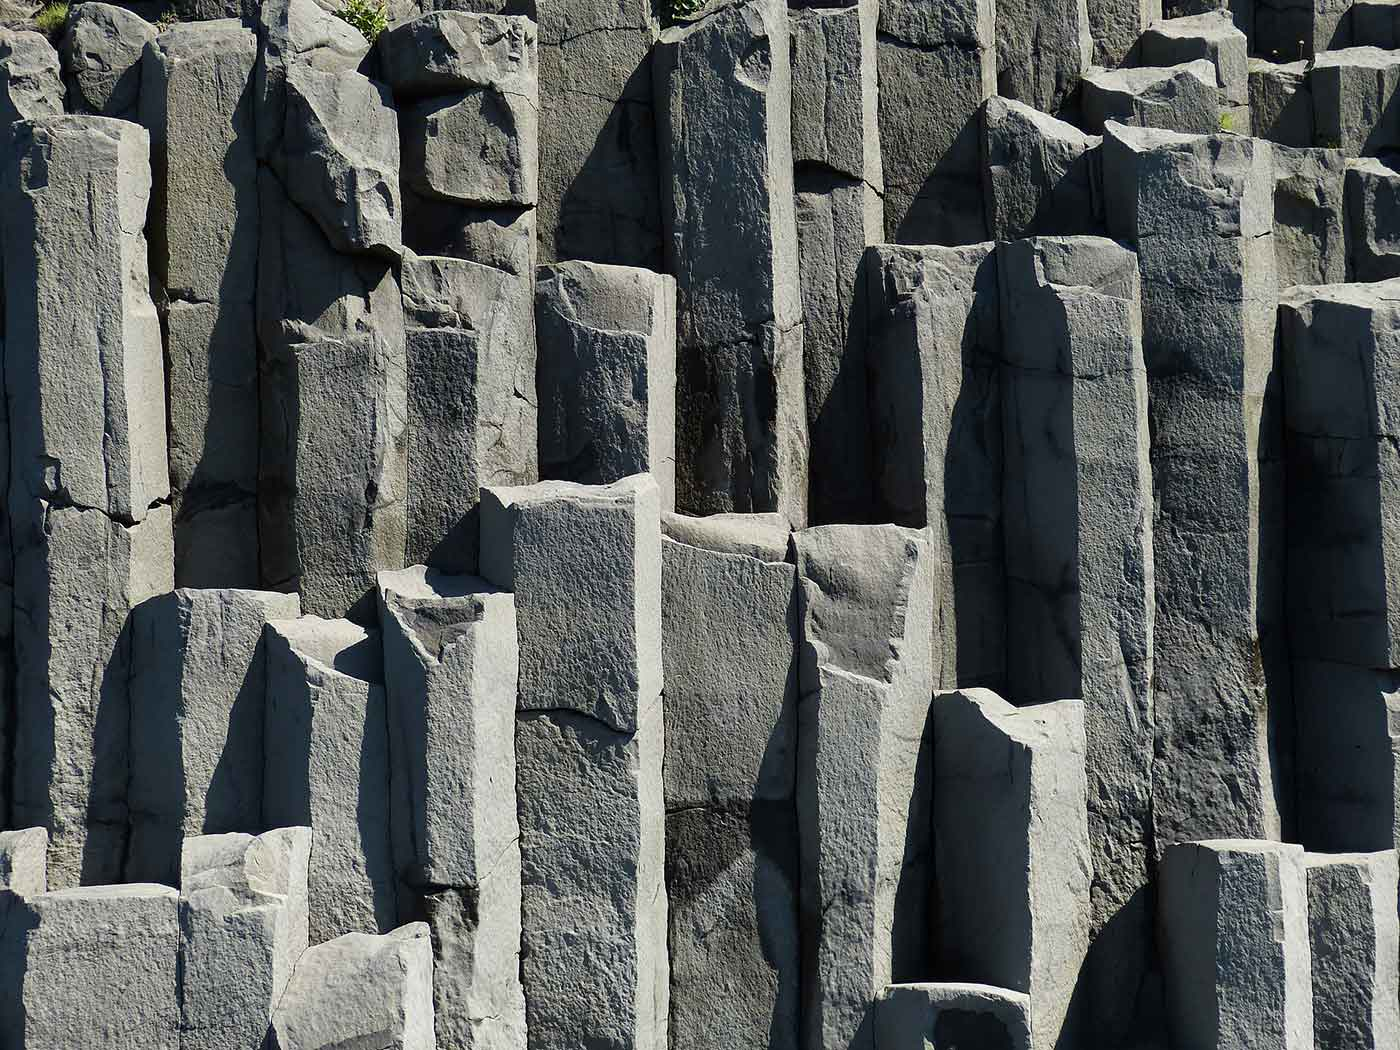 Chipped rocks